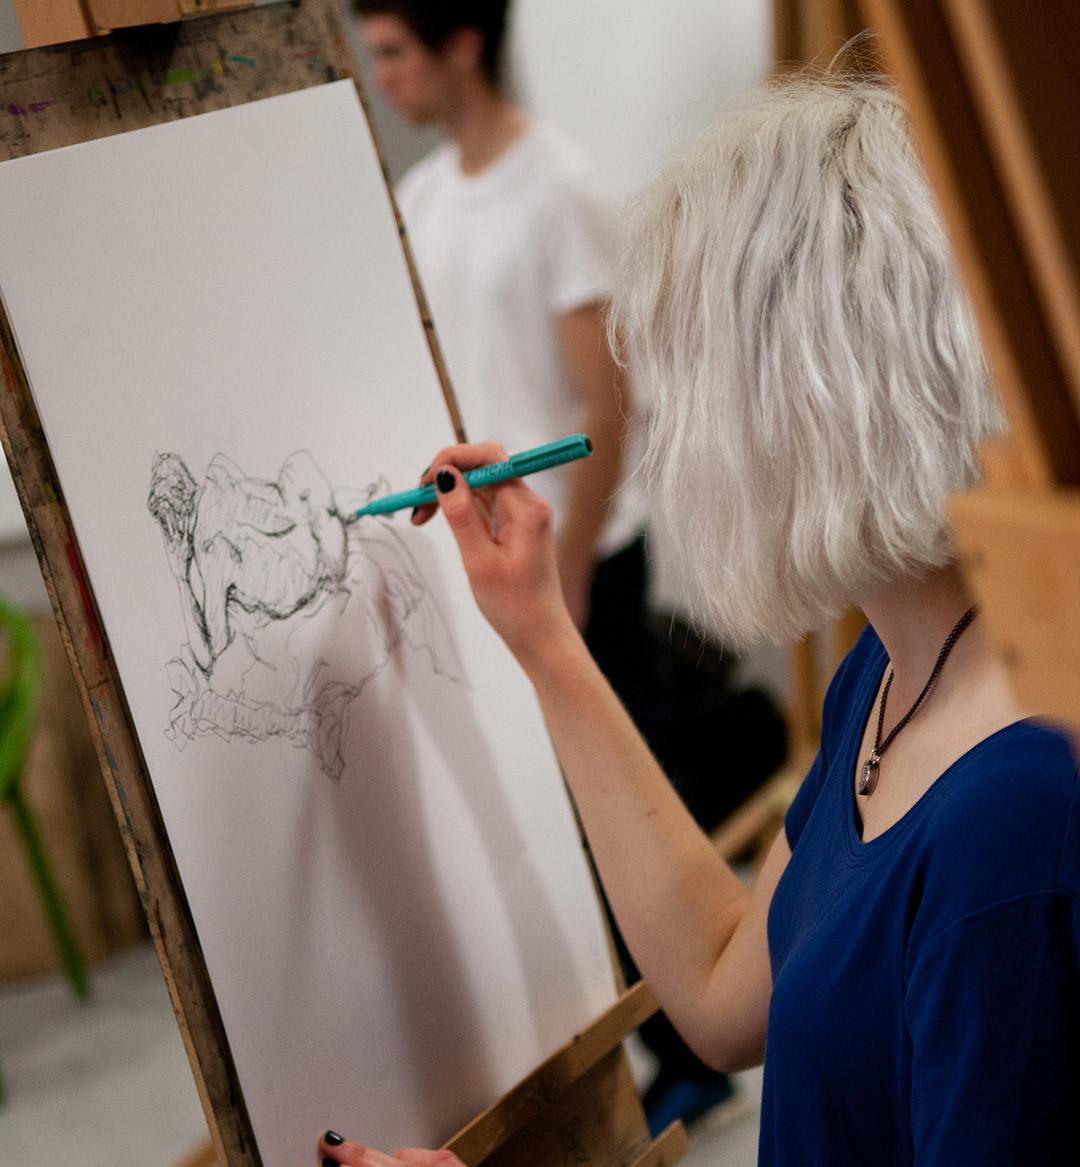 Student draws live model